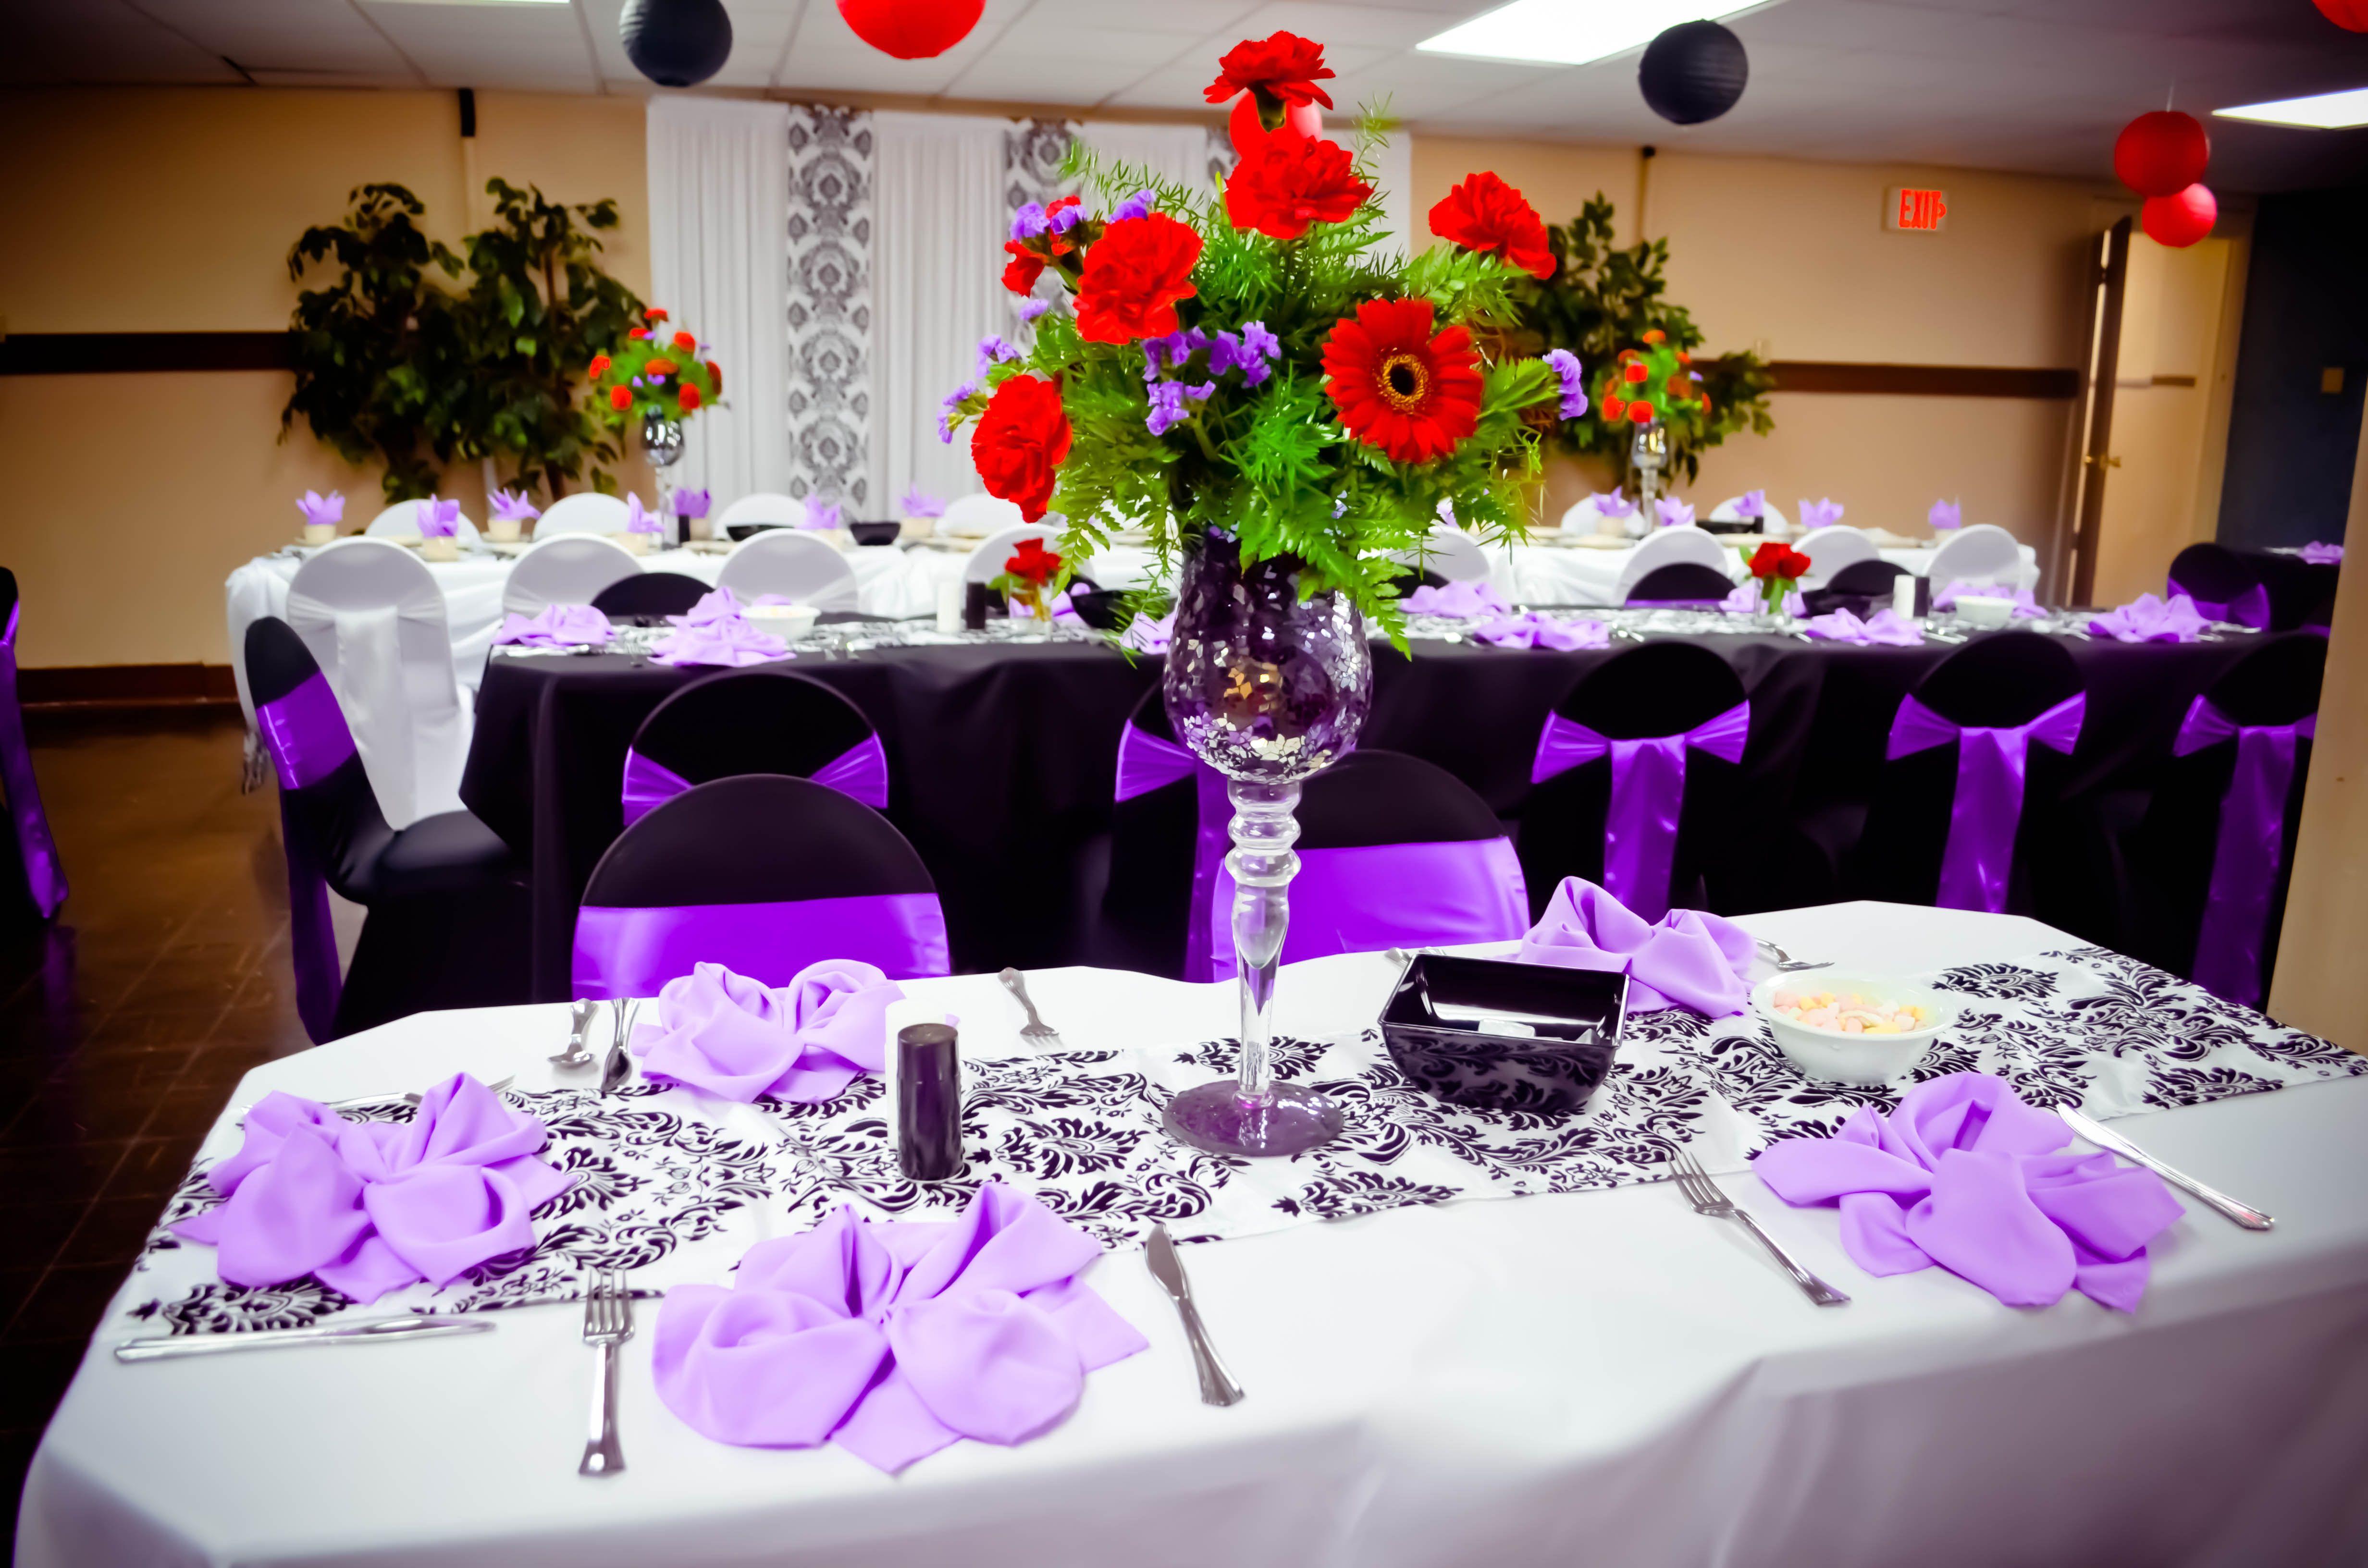 Event Black & White Spandex Chair Covers Purple Satin Sashes